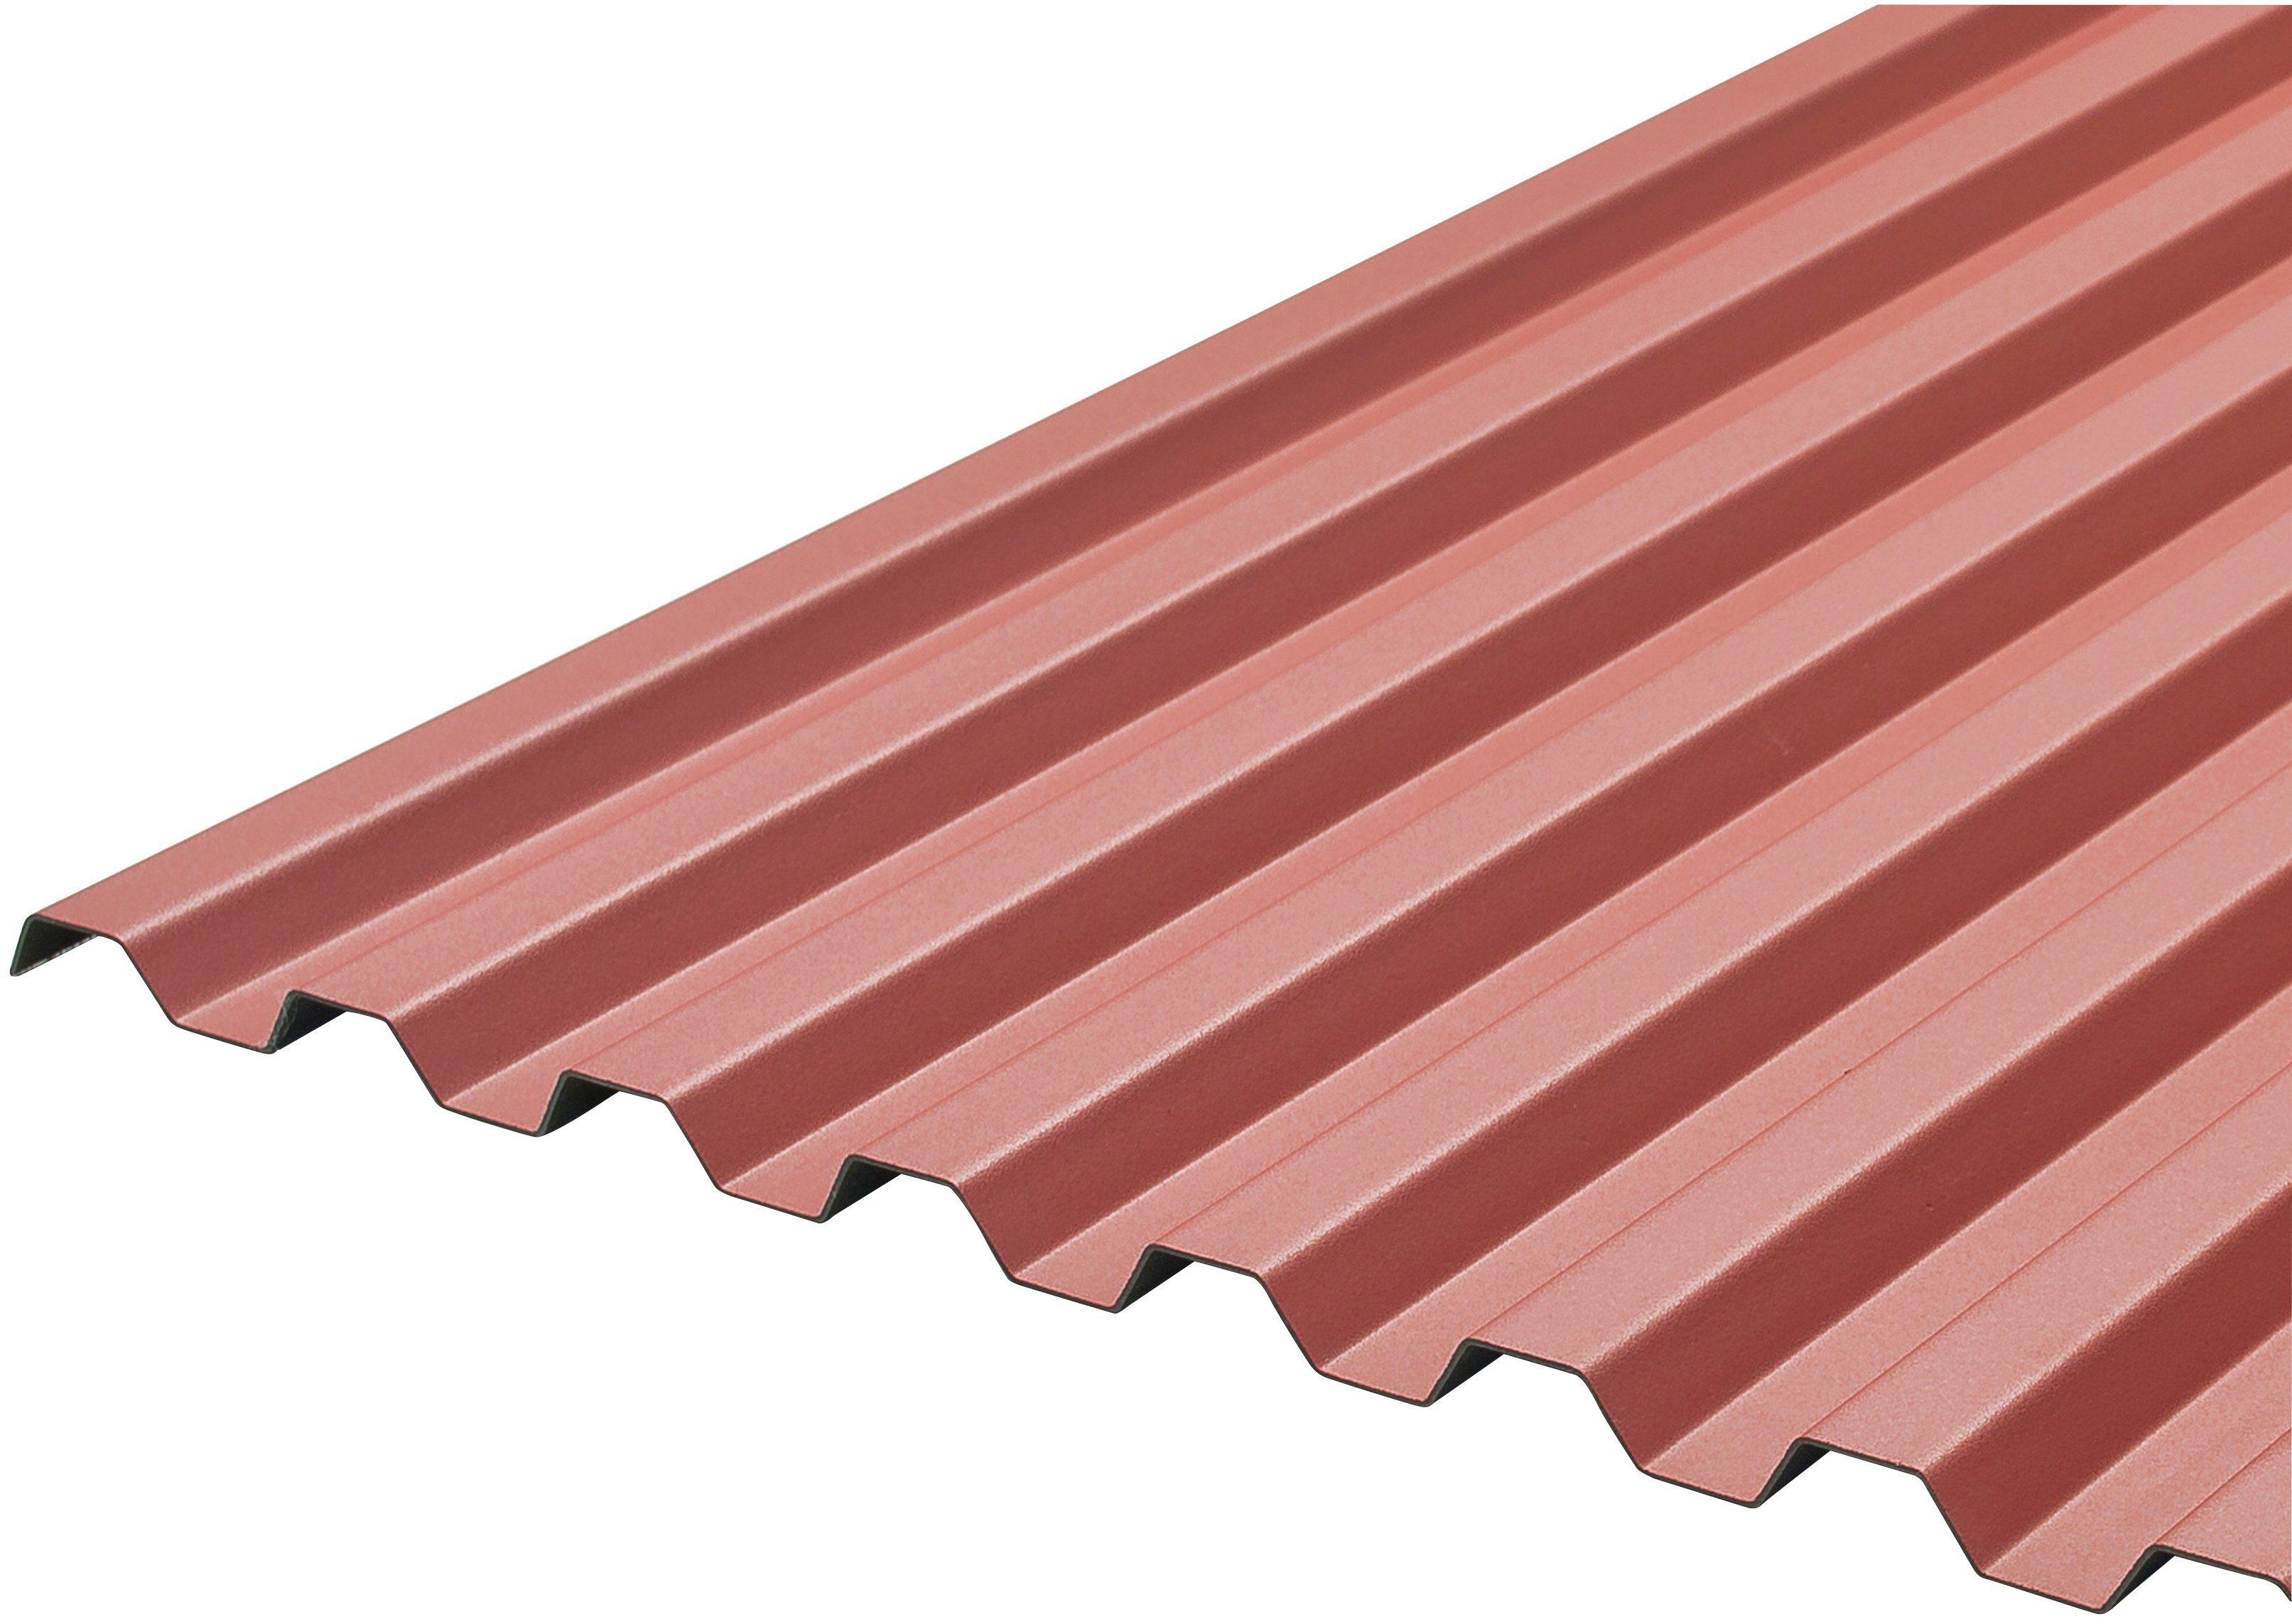 Wellplatte »WSP 70/18 trapez«, rot, 19,2 m², inkl. Befestigung